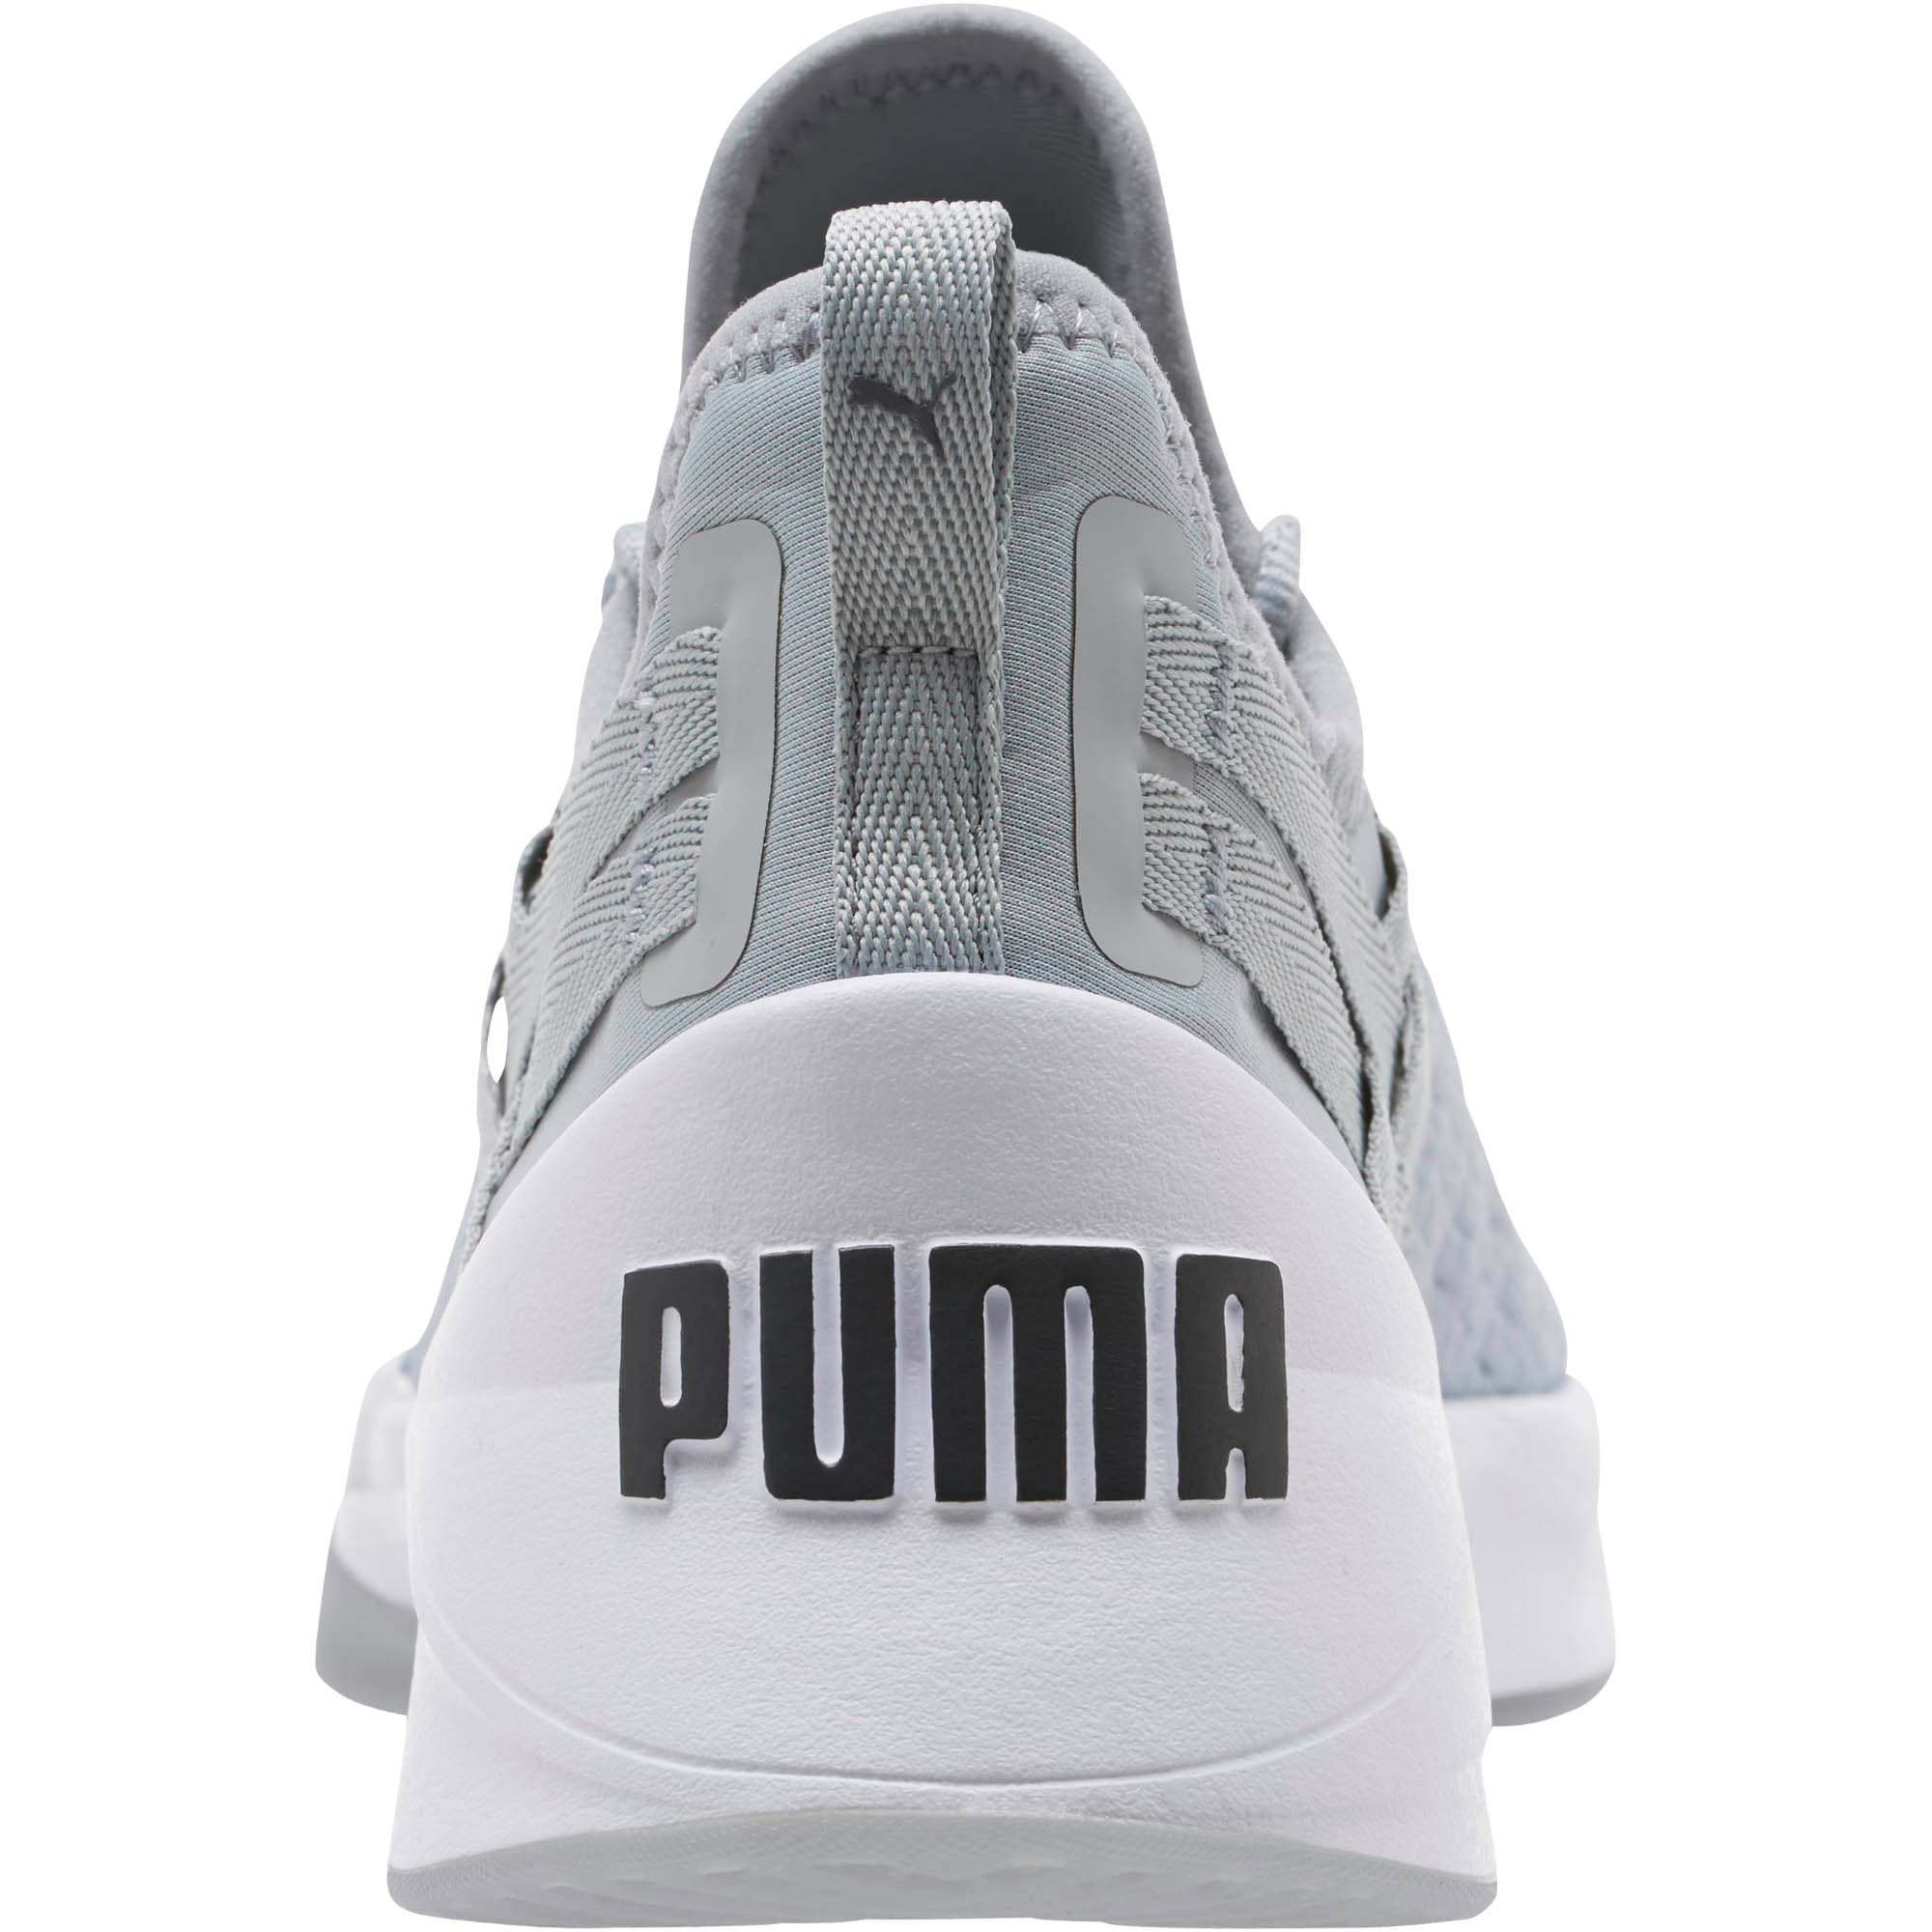 Thumbnail 3 of Jaab XT Women's Training Shoes, Quarry-Puma White, medium